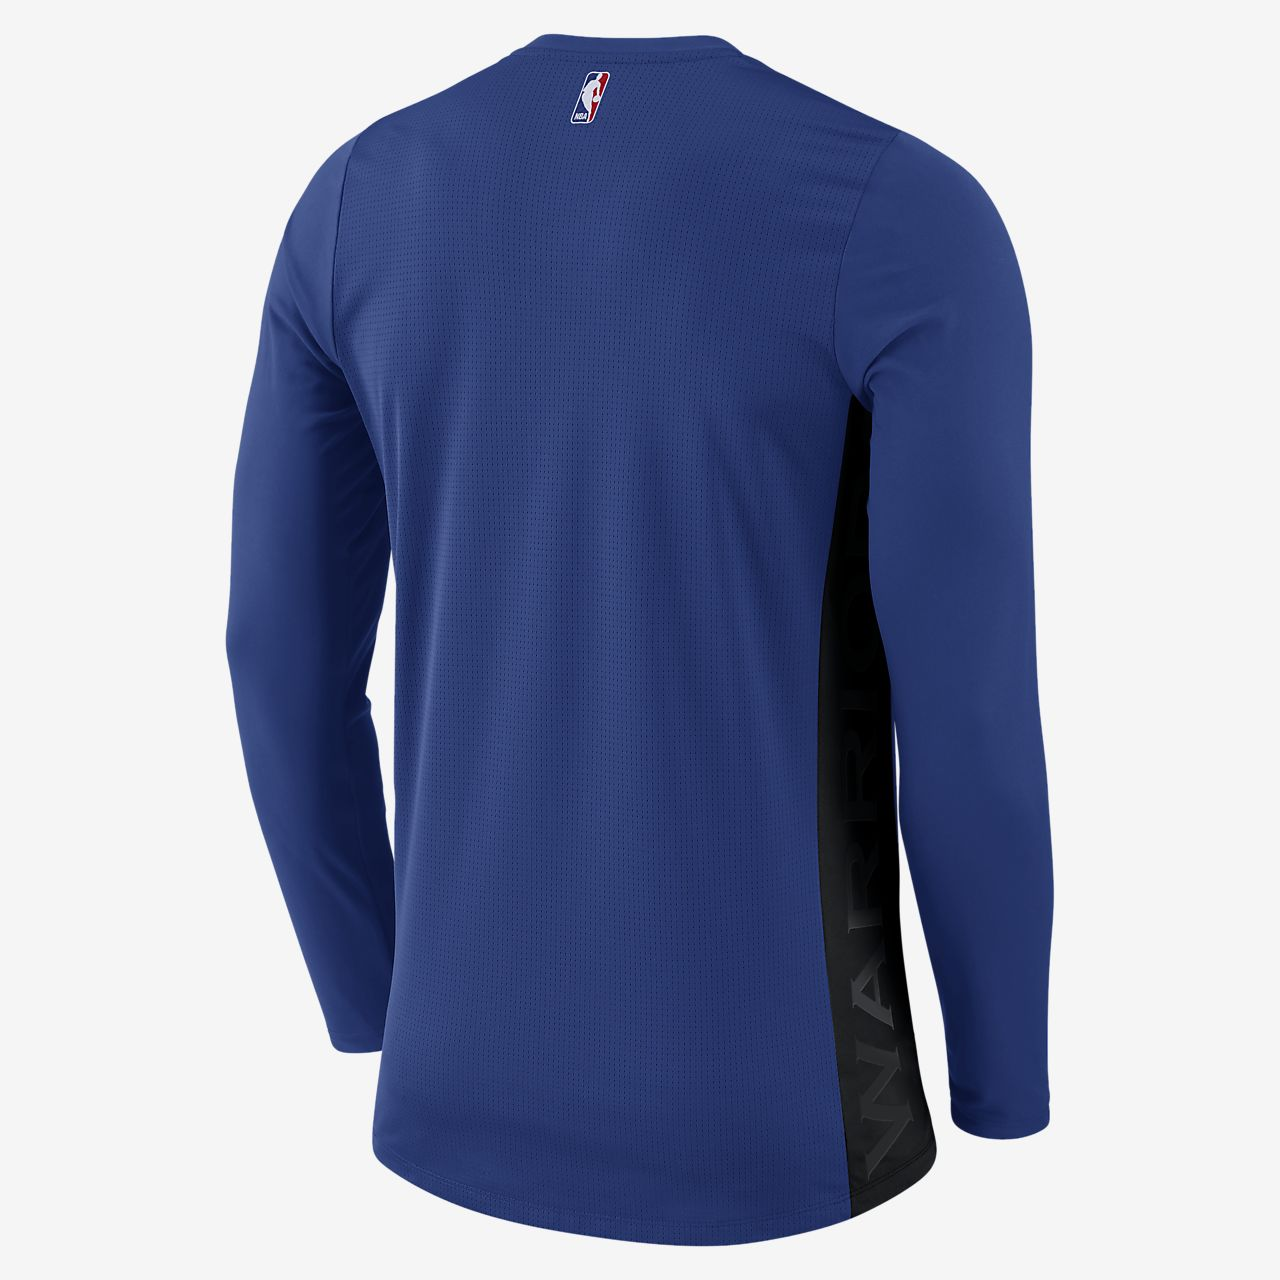 f75878dd Golden State Warriors Nike Hyper Elite Men's Long-Sleeve NBA Top ...